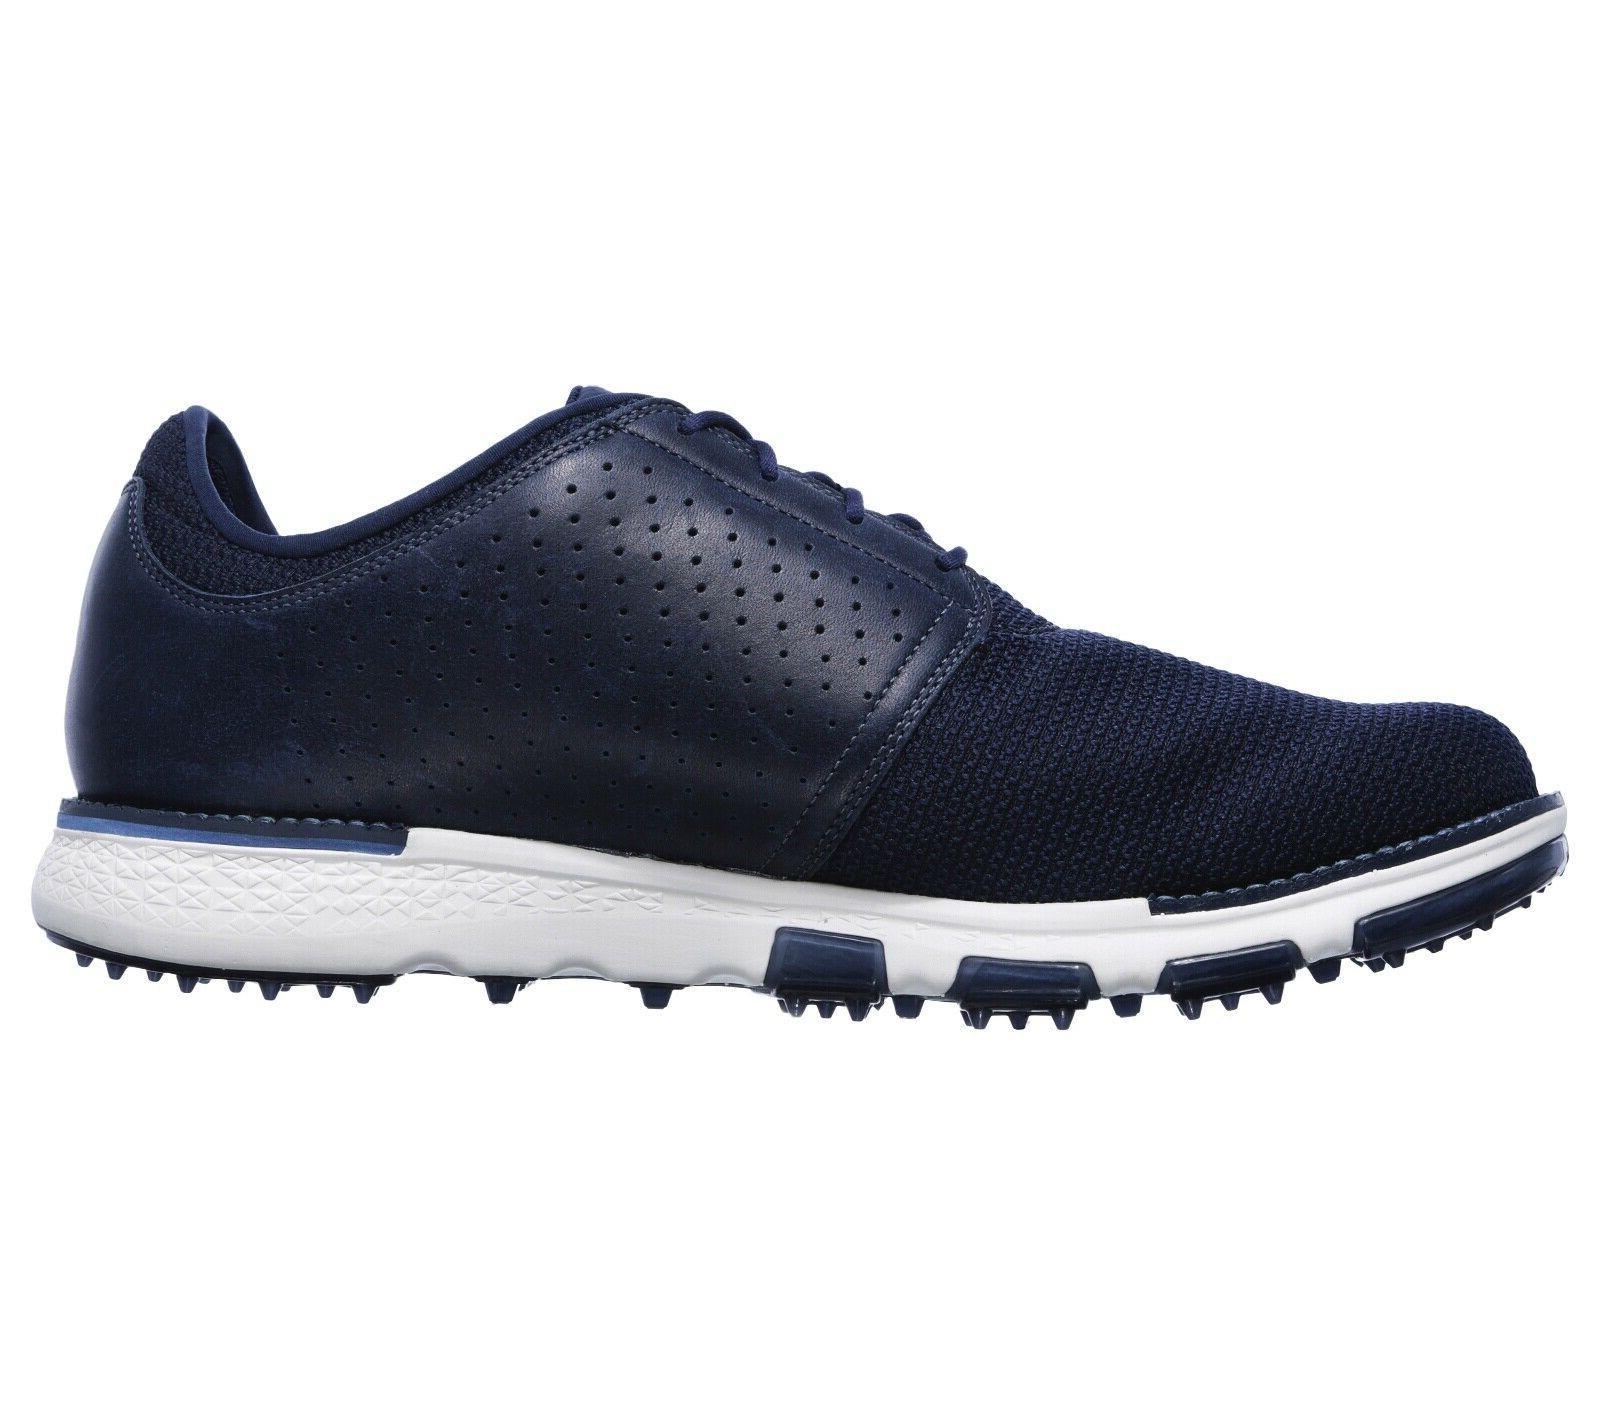 Skechers Golf V.3 Approach-RF Shoes-Style 54522-NVY